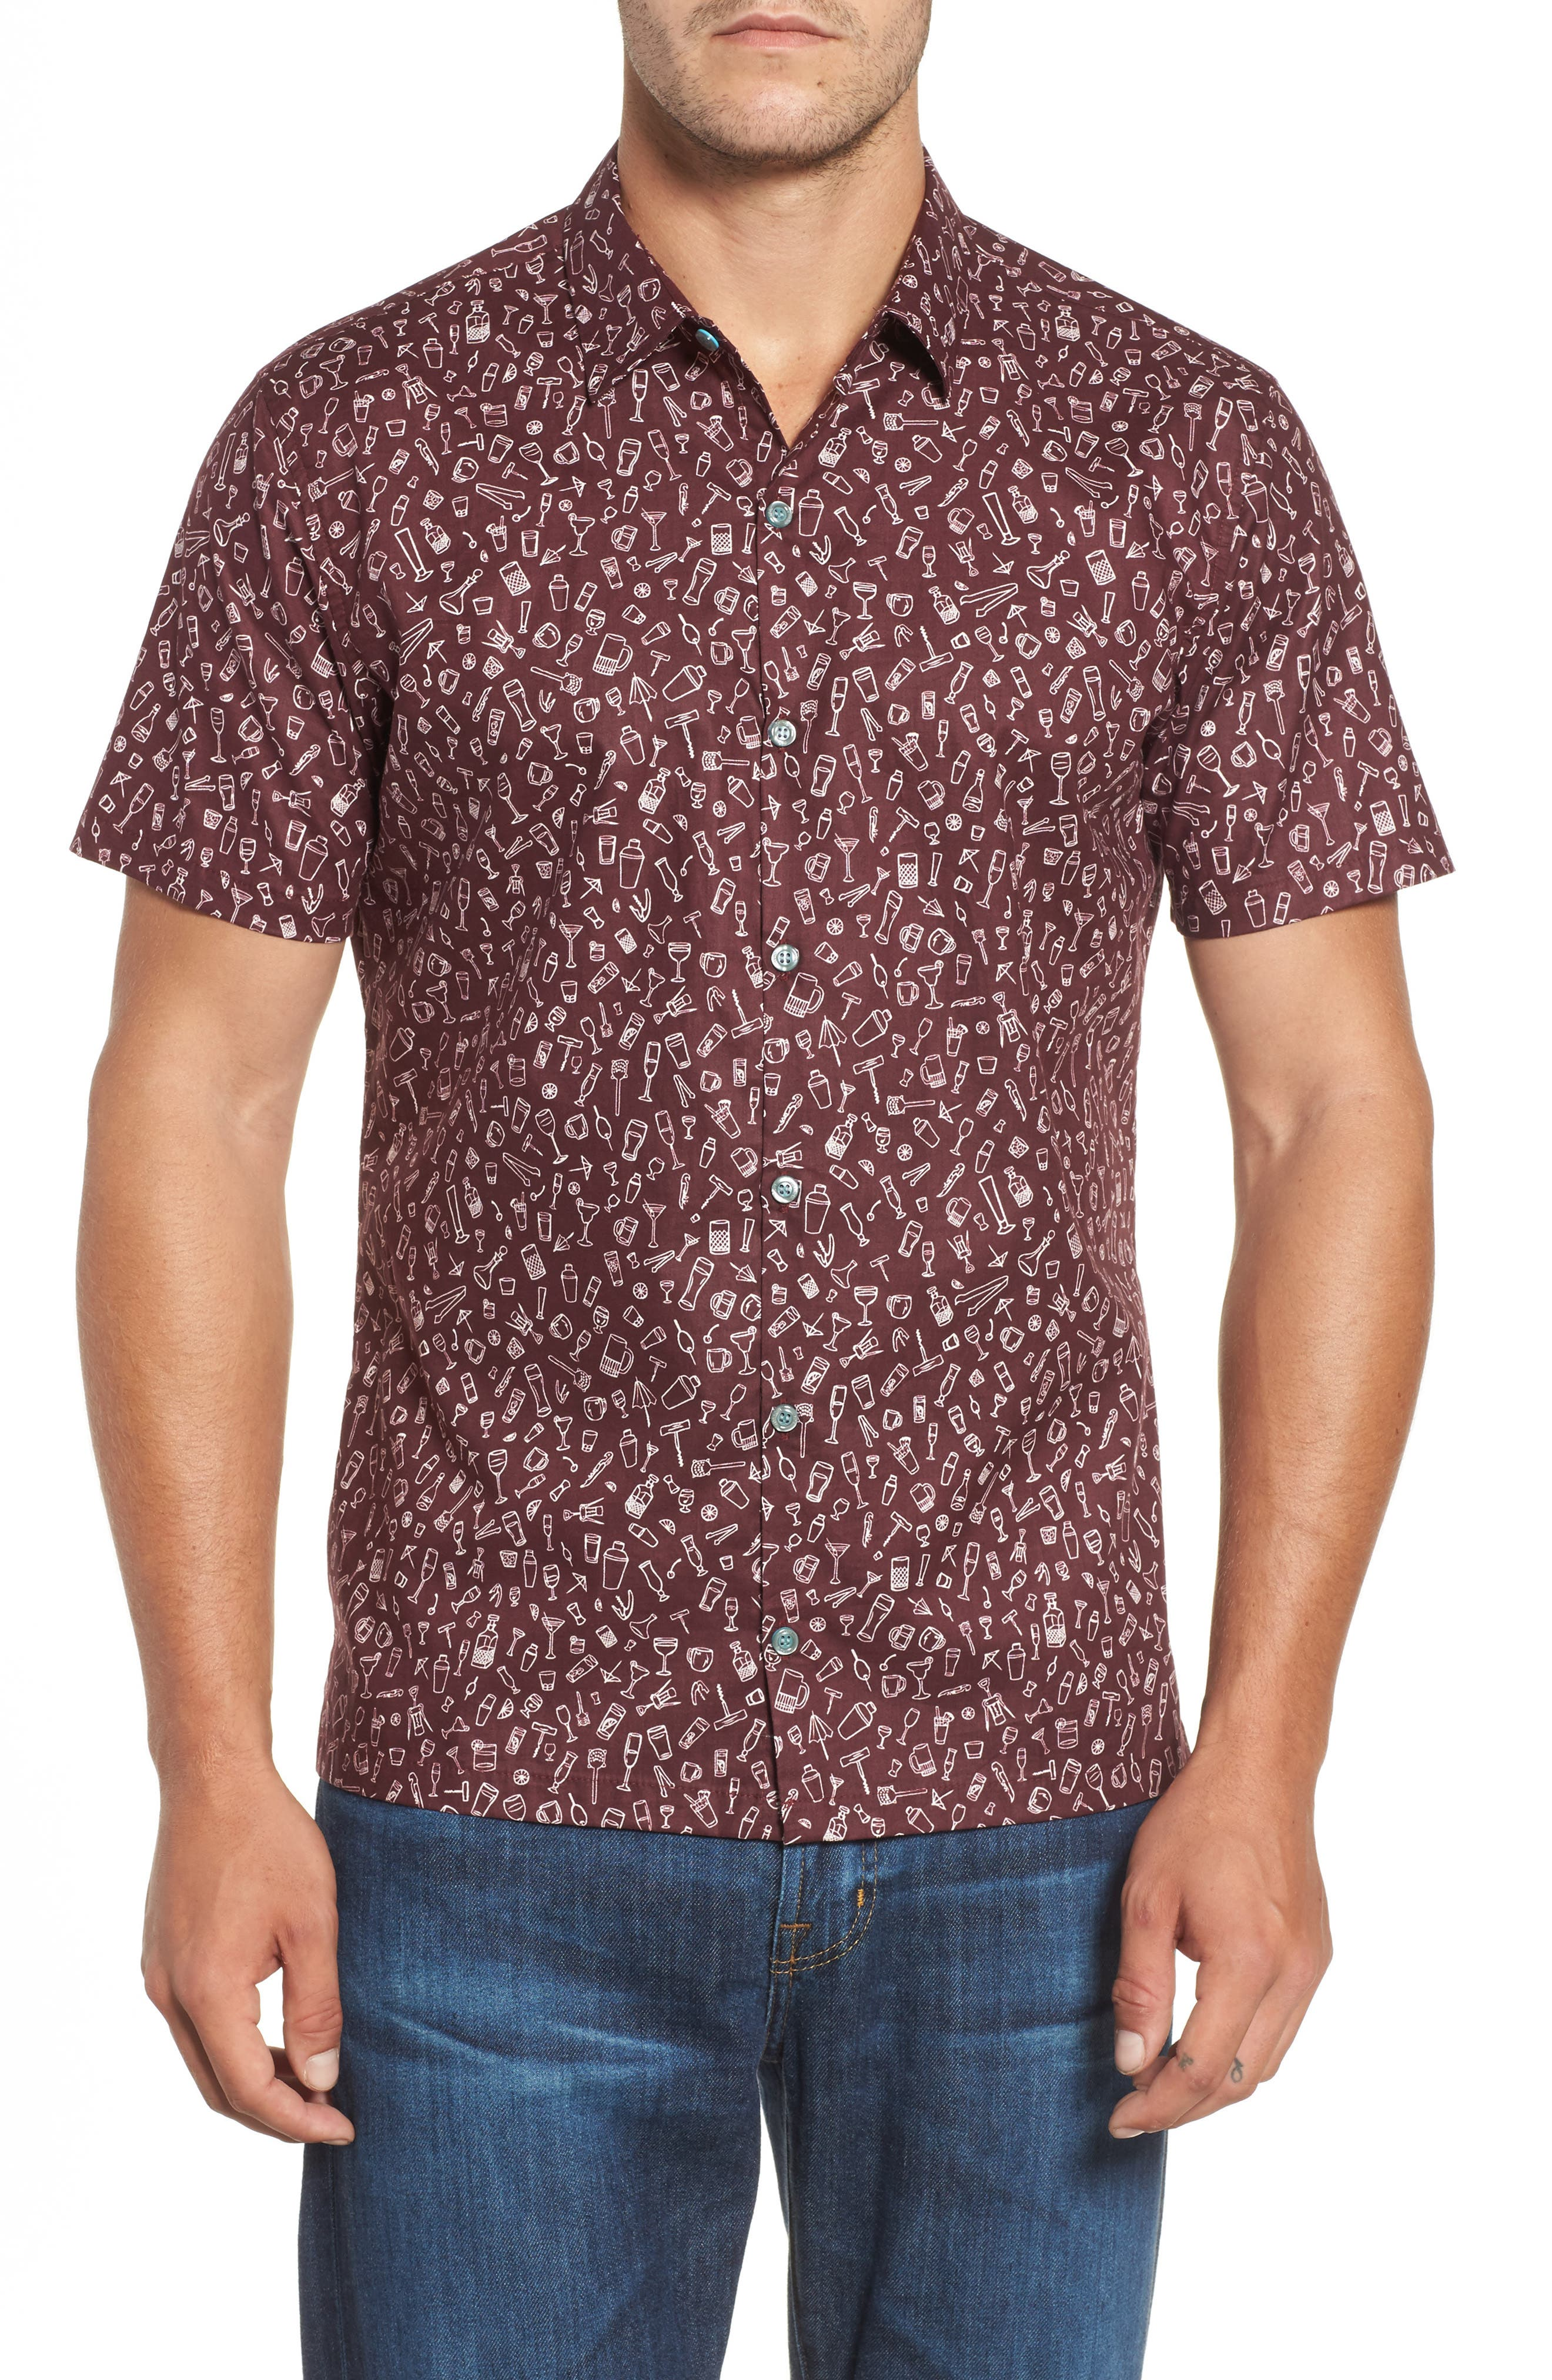 5 PM Slim Fit Camp Shirt,                             Main thumbnail 1, color,                             Wine